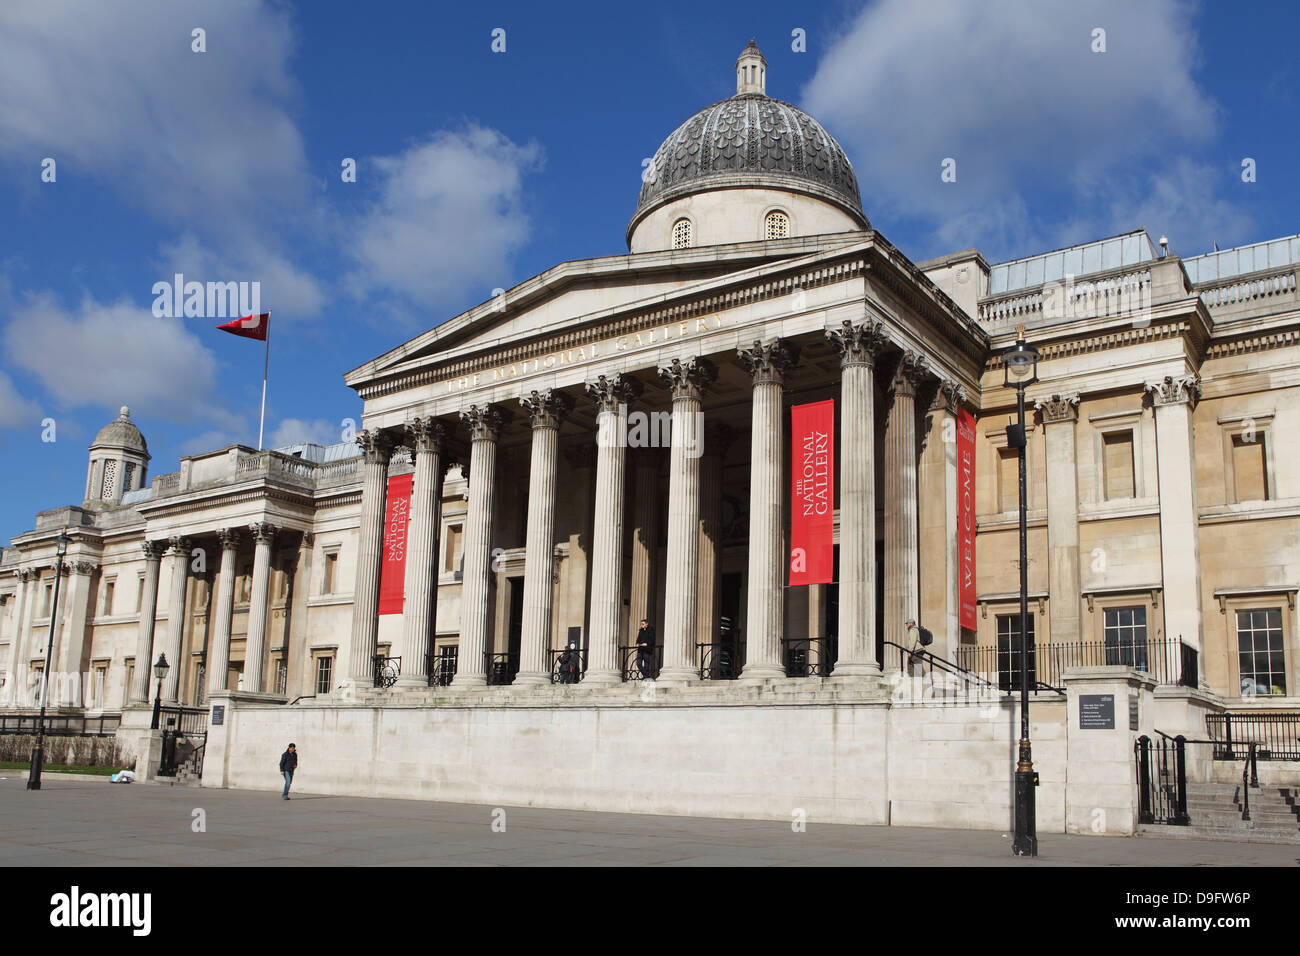 La National Gallery, Trafalgar Square, London, England, UK Photo Stock